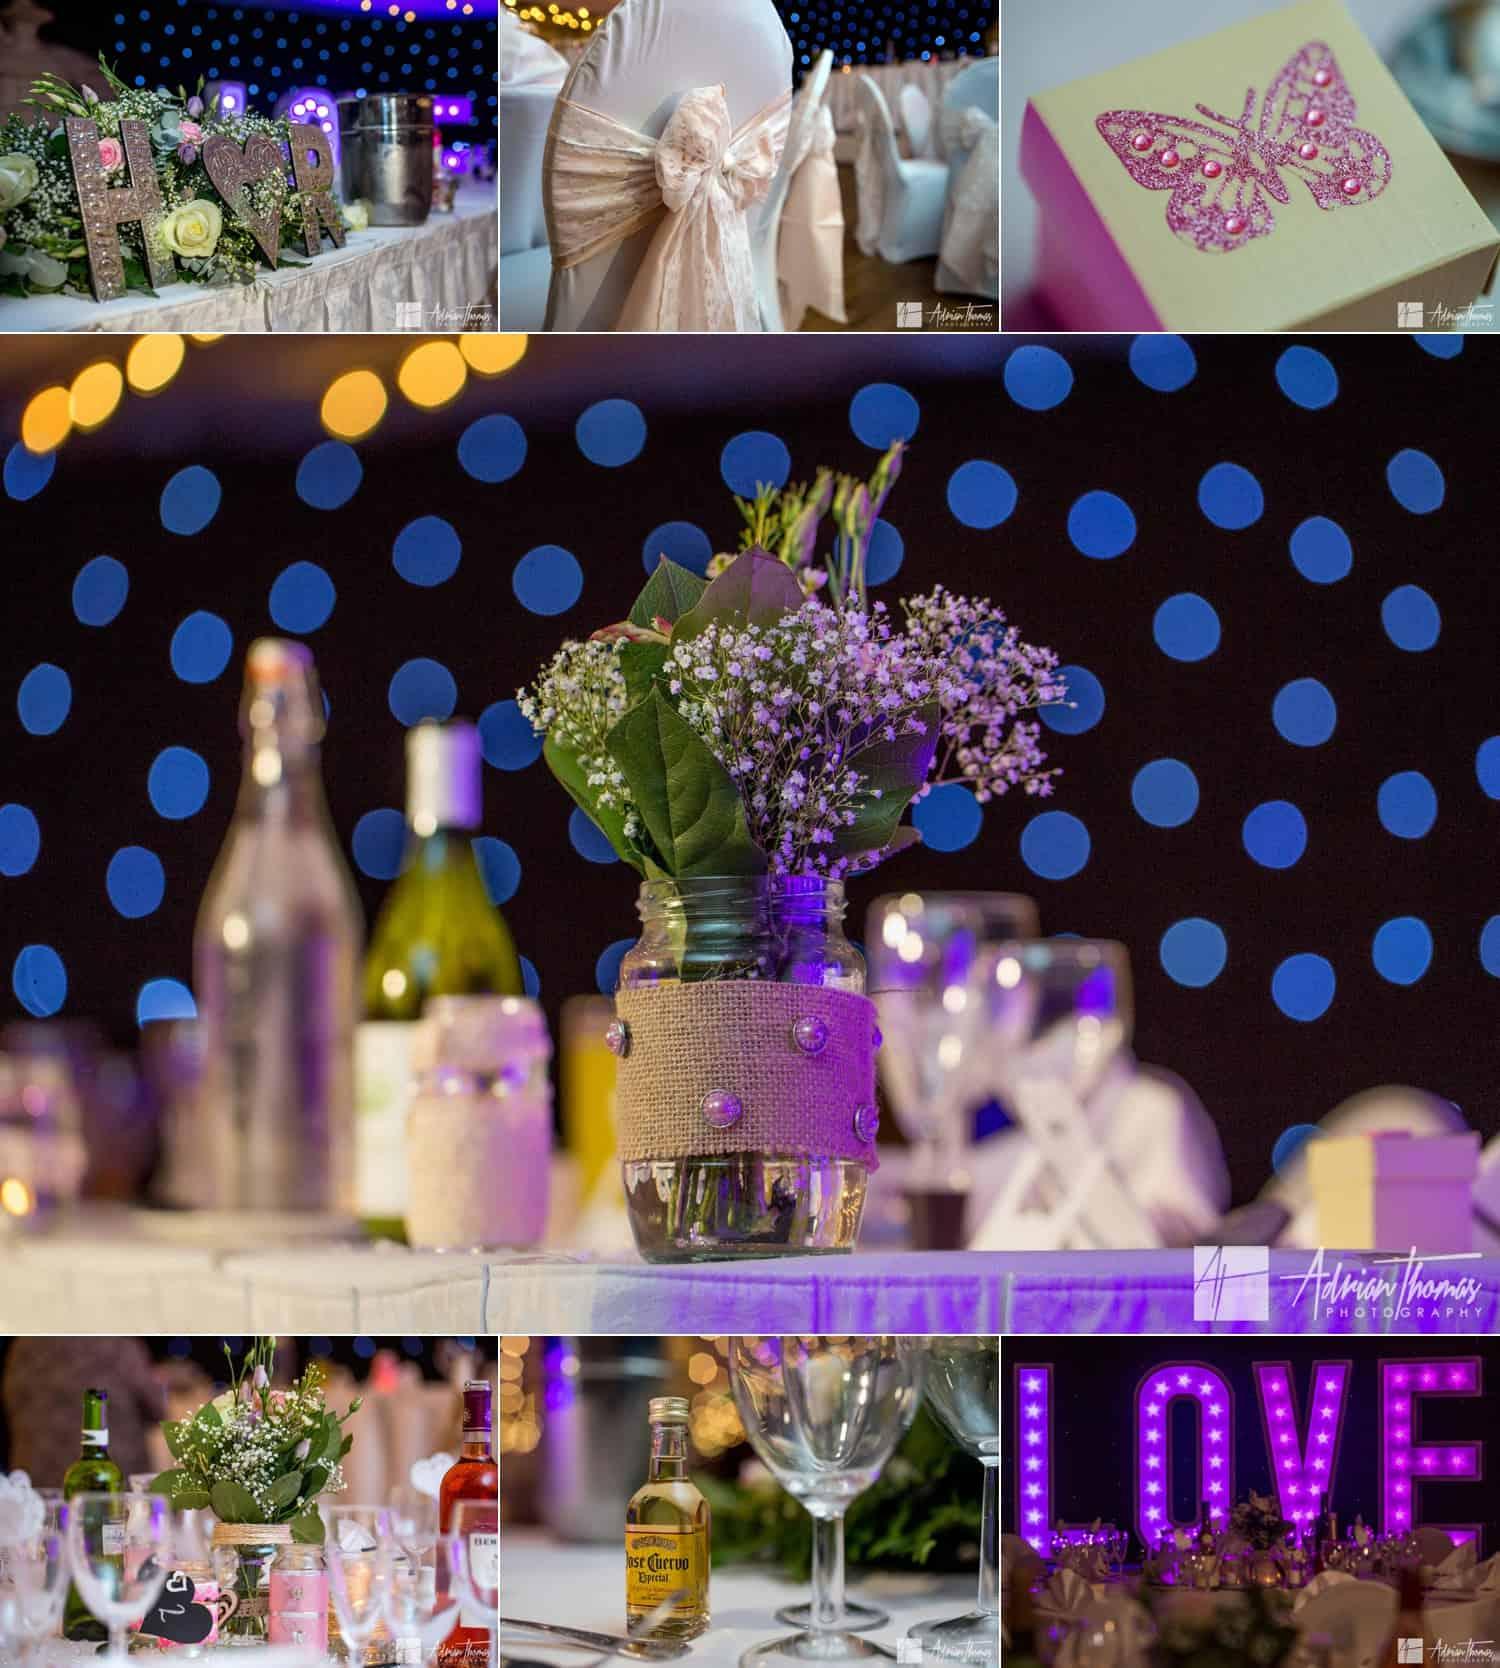 Table decor inside Maes Manor Hotel wedding reception.